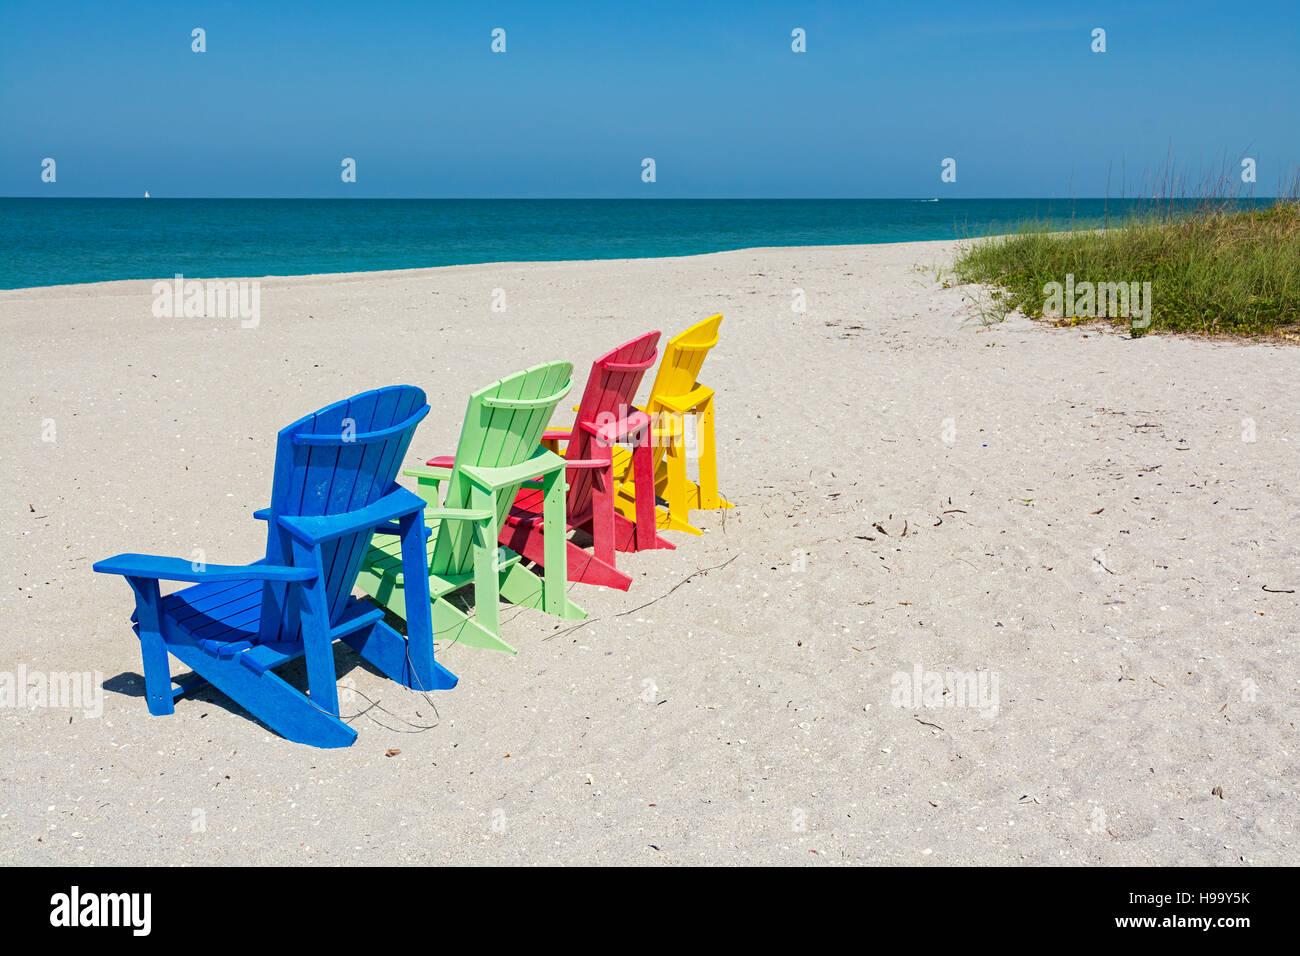 Bon Florida, Captiva Island, Captiva Beach, Beach Chairs